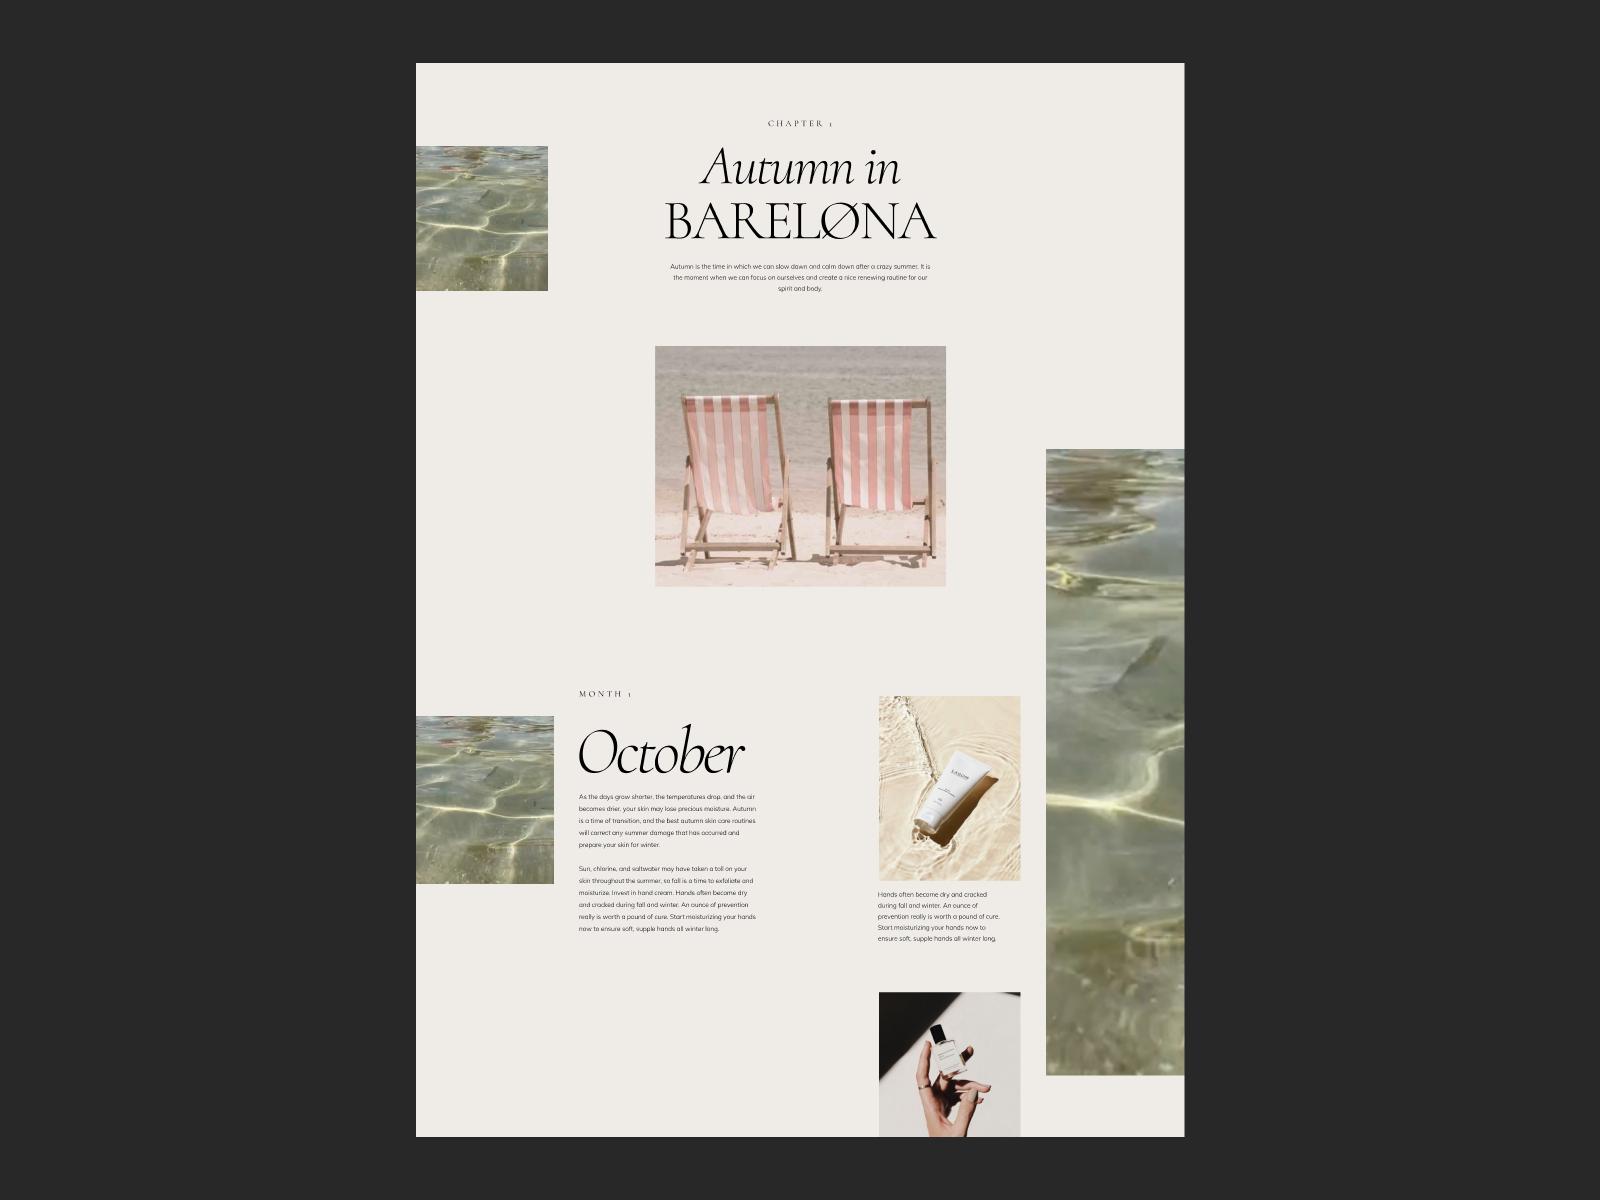 Autumn in Barcelona Issue 78 by Barbara Skrodzka